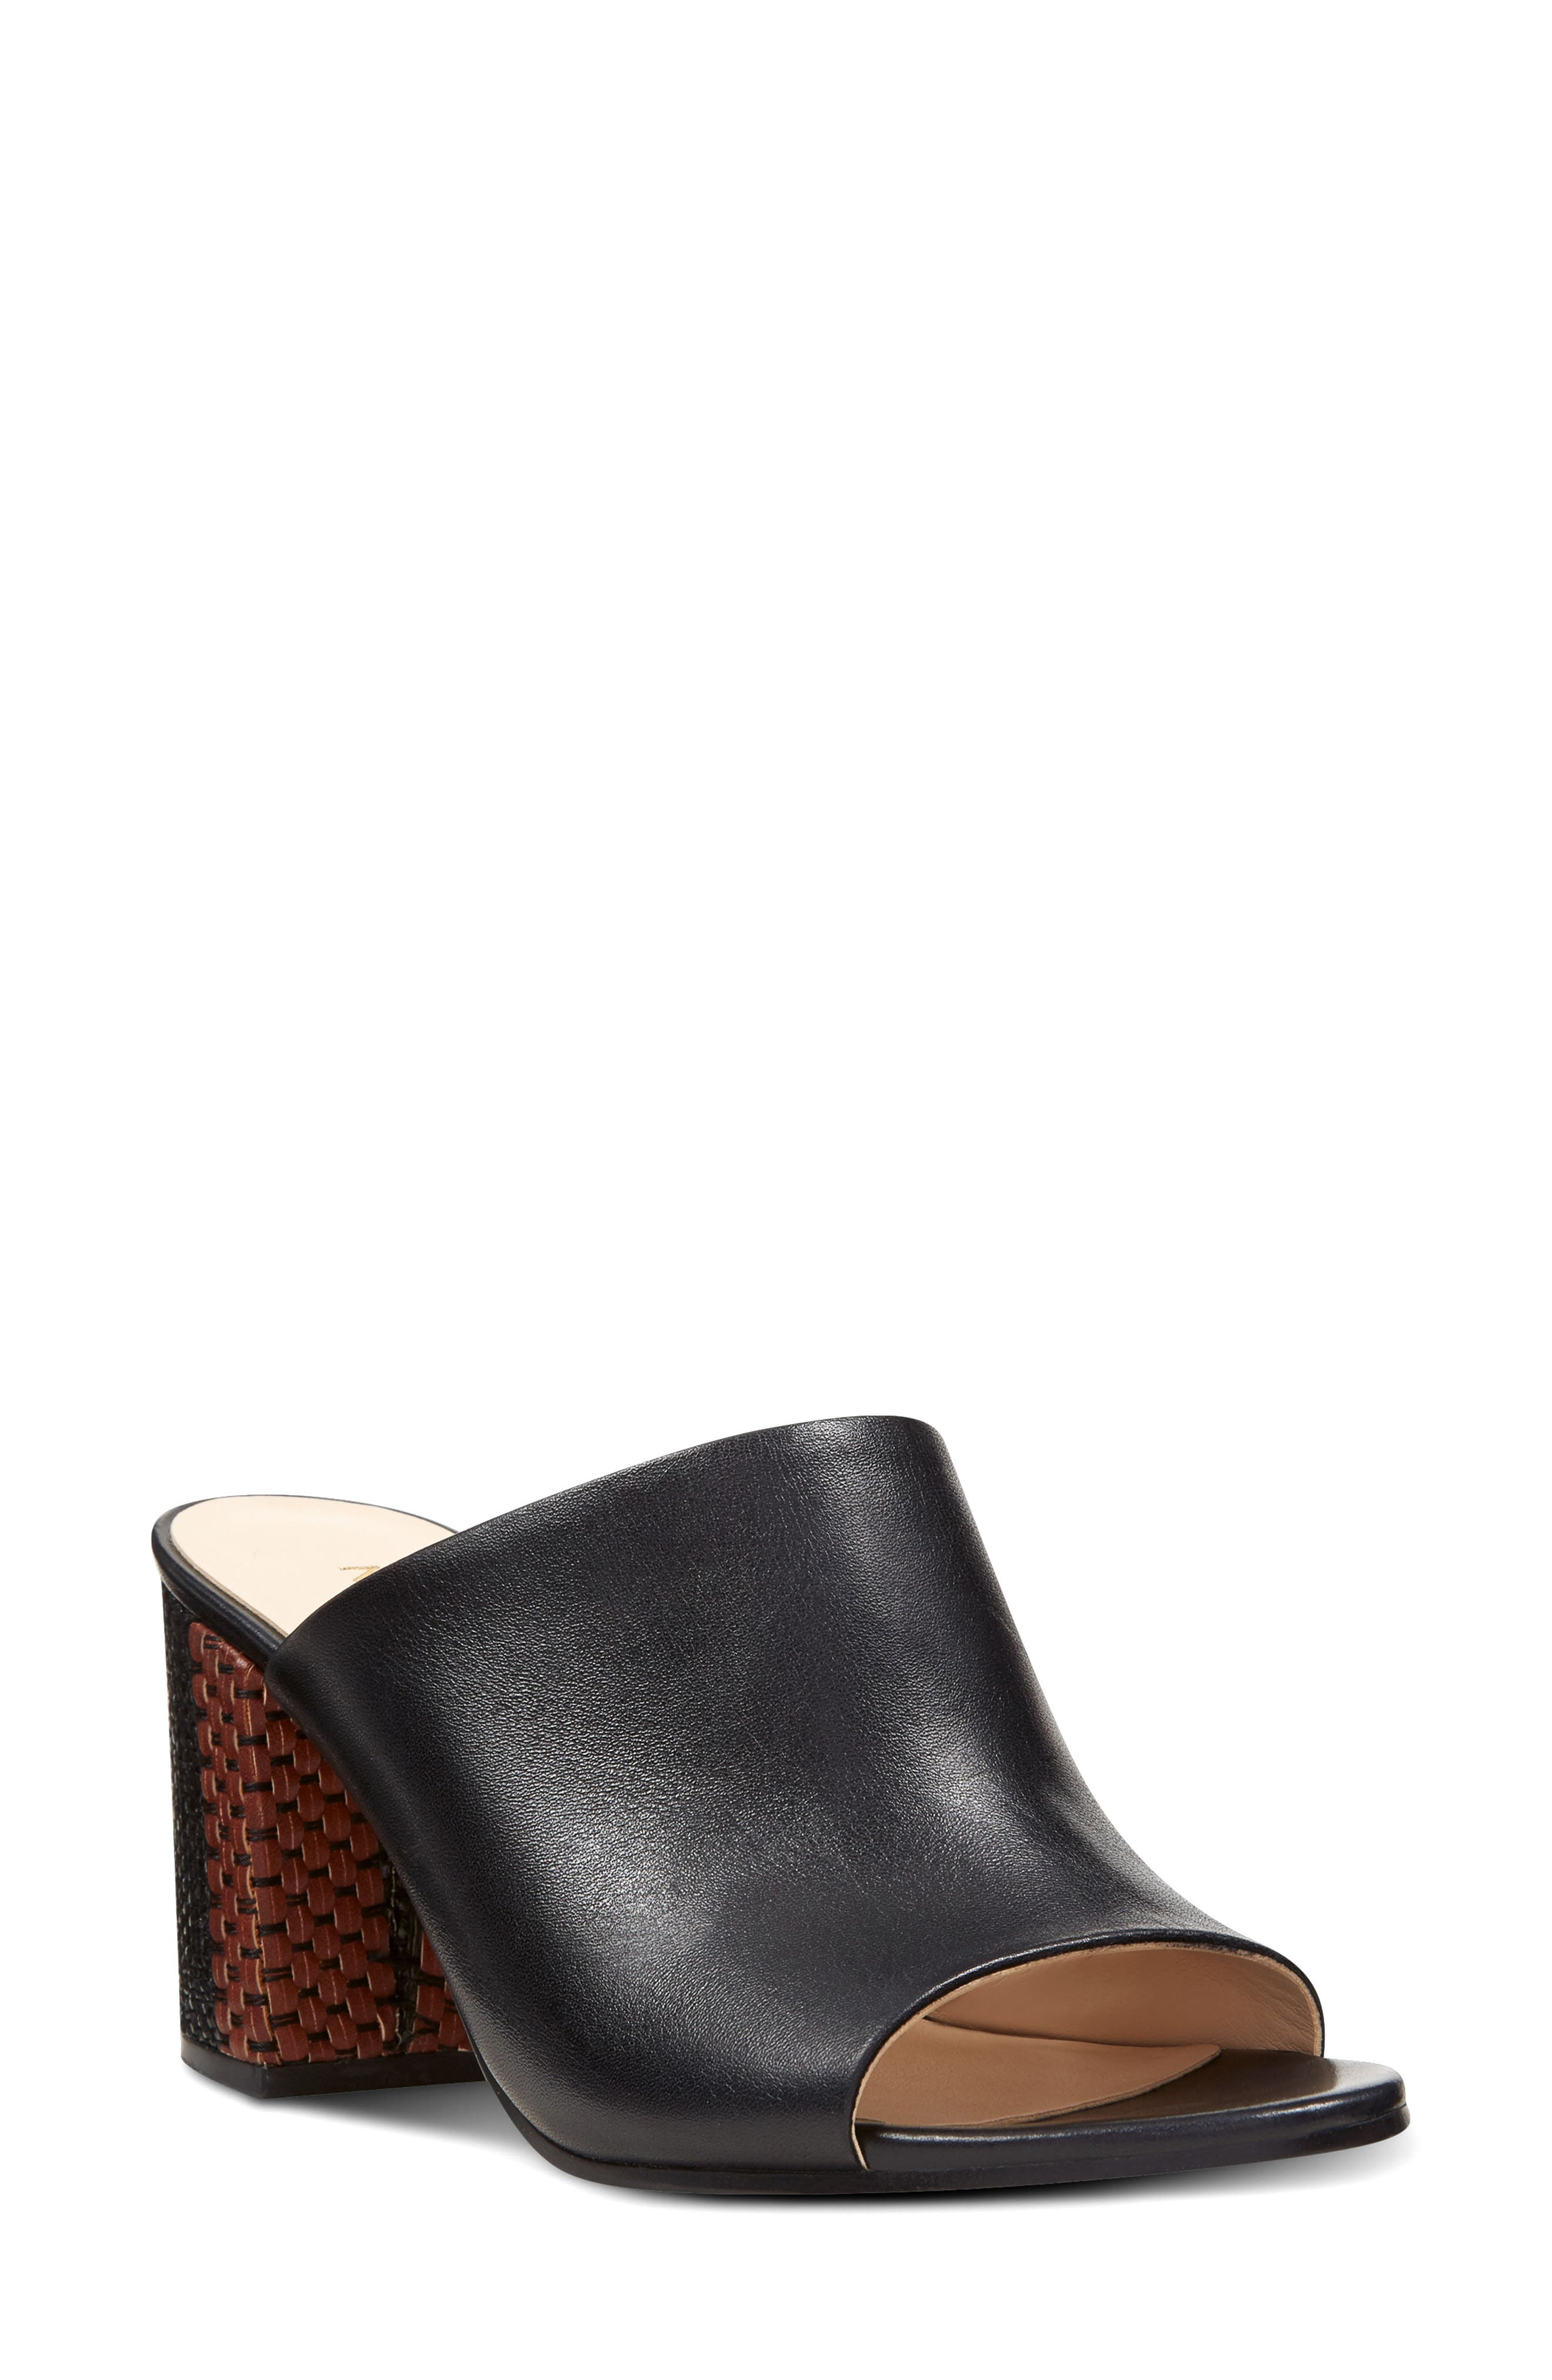 Alternate Image 1 Selected - Nine West Gemily Block Heel Slide Sandal (Women)